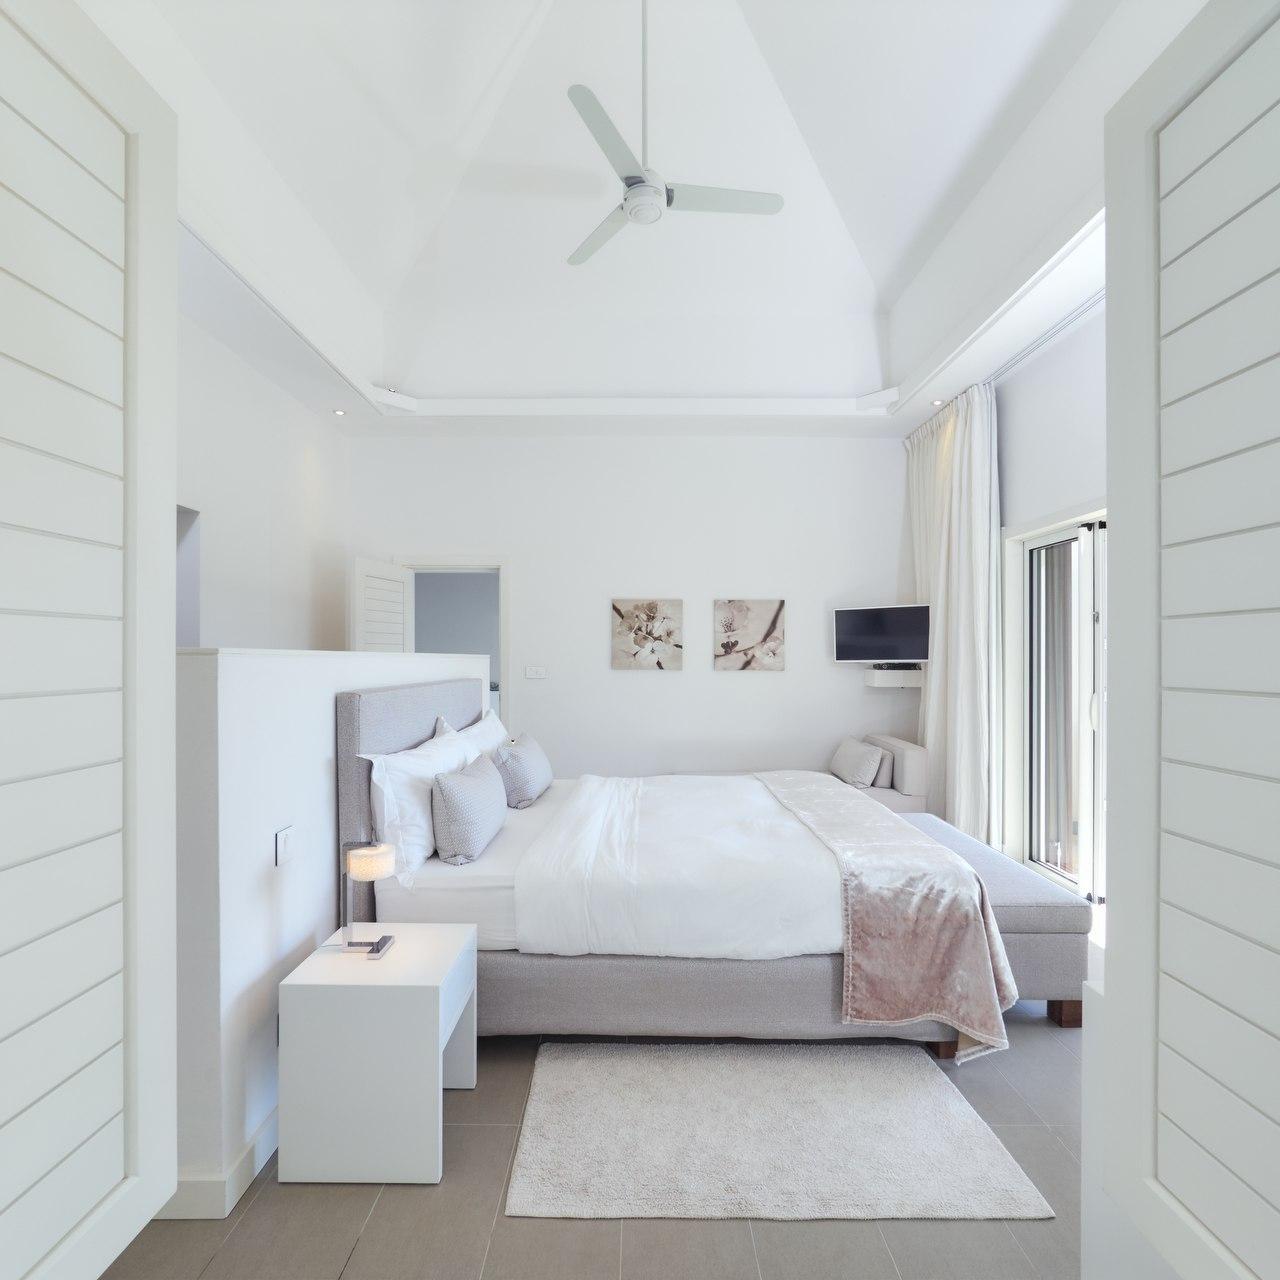 Hohe Decke Bilder Ideen Couch